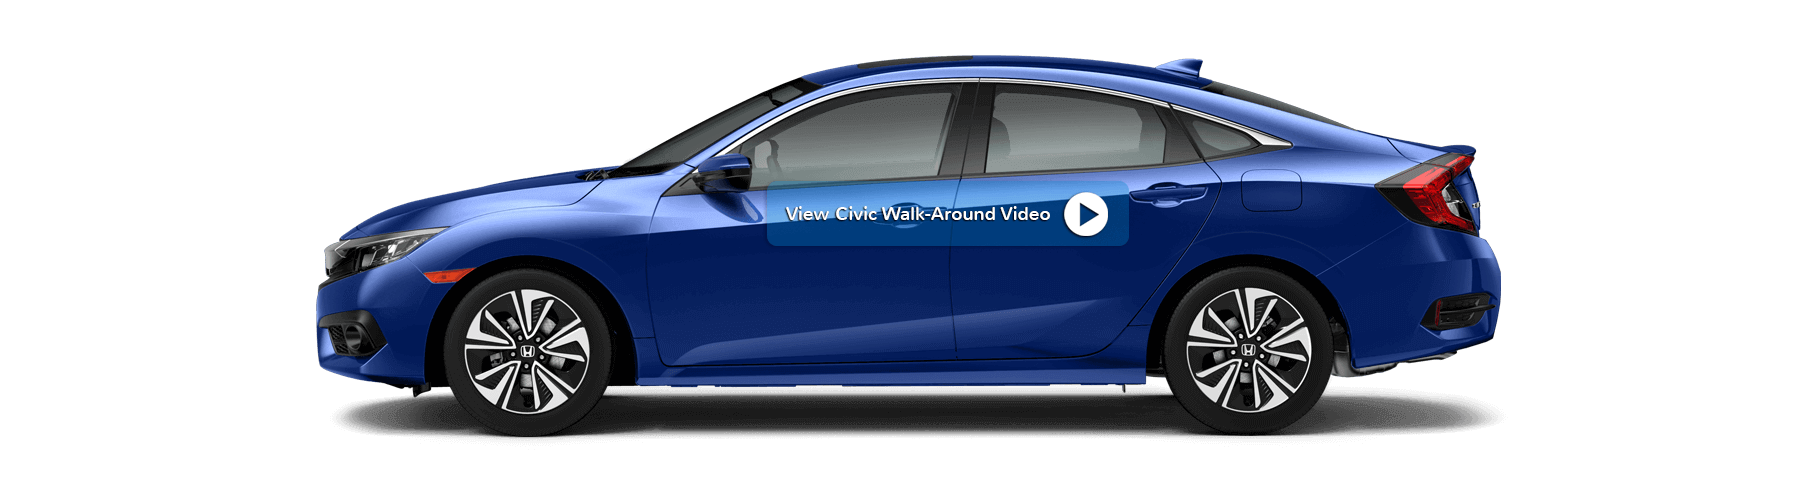 2017 Honda Civic Sedan Side Profile